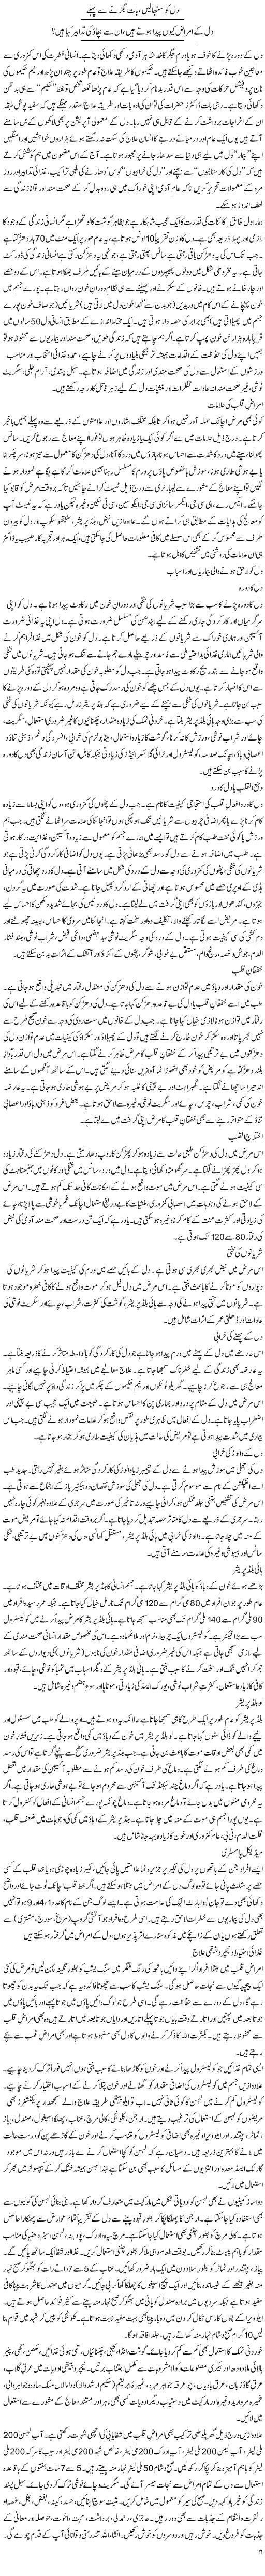 Heart Disease, Causes, Preventions, Symptoms & Treatment (Urdu-English)